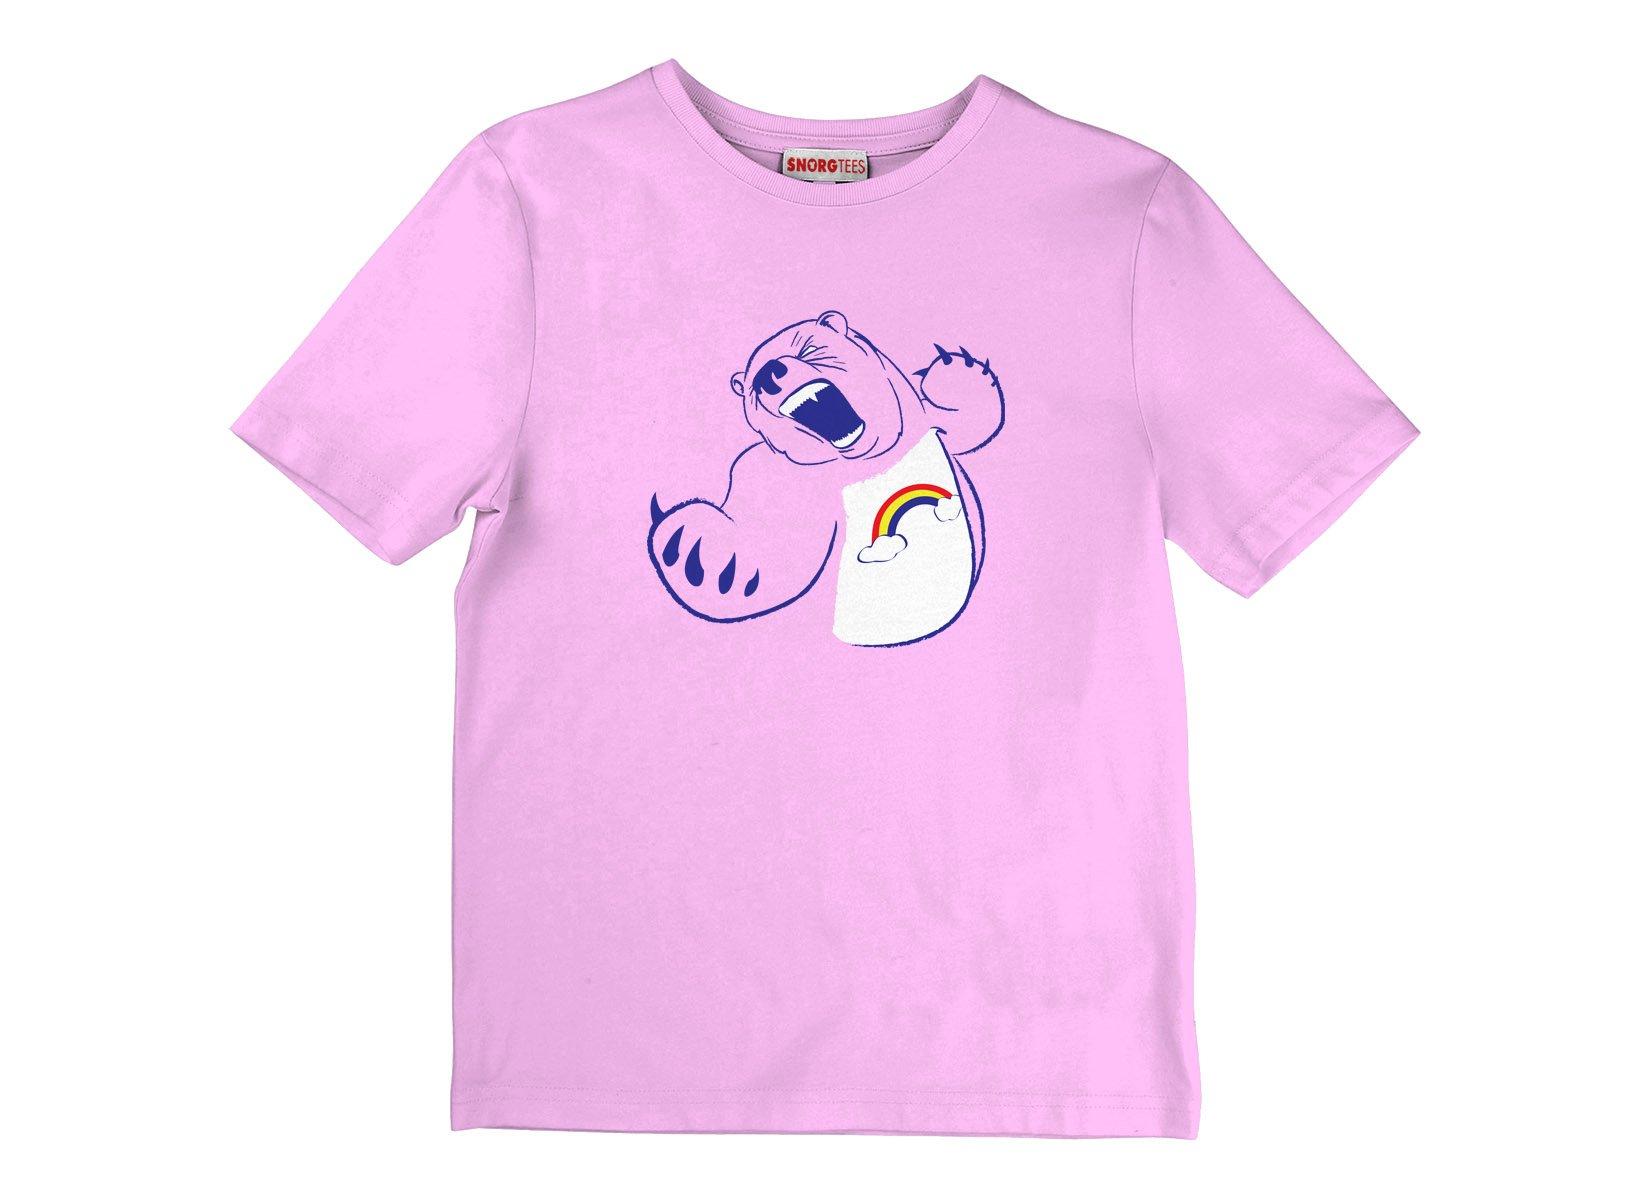 Scarebear on Kids T-Shirt